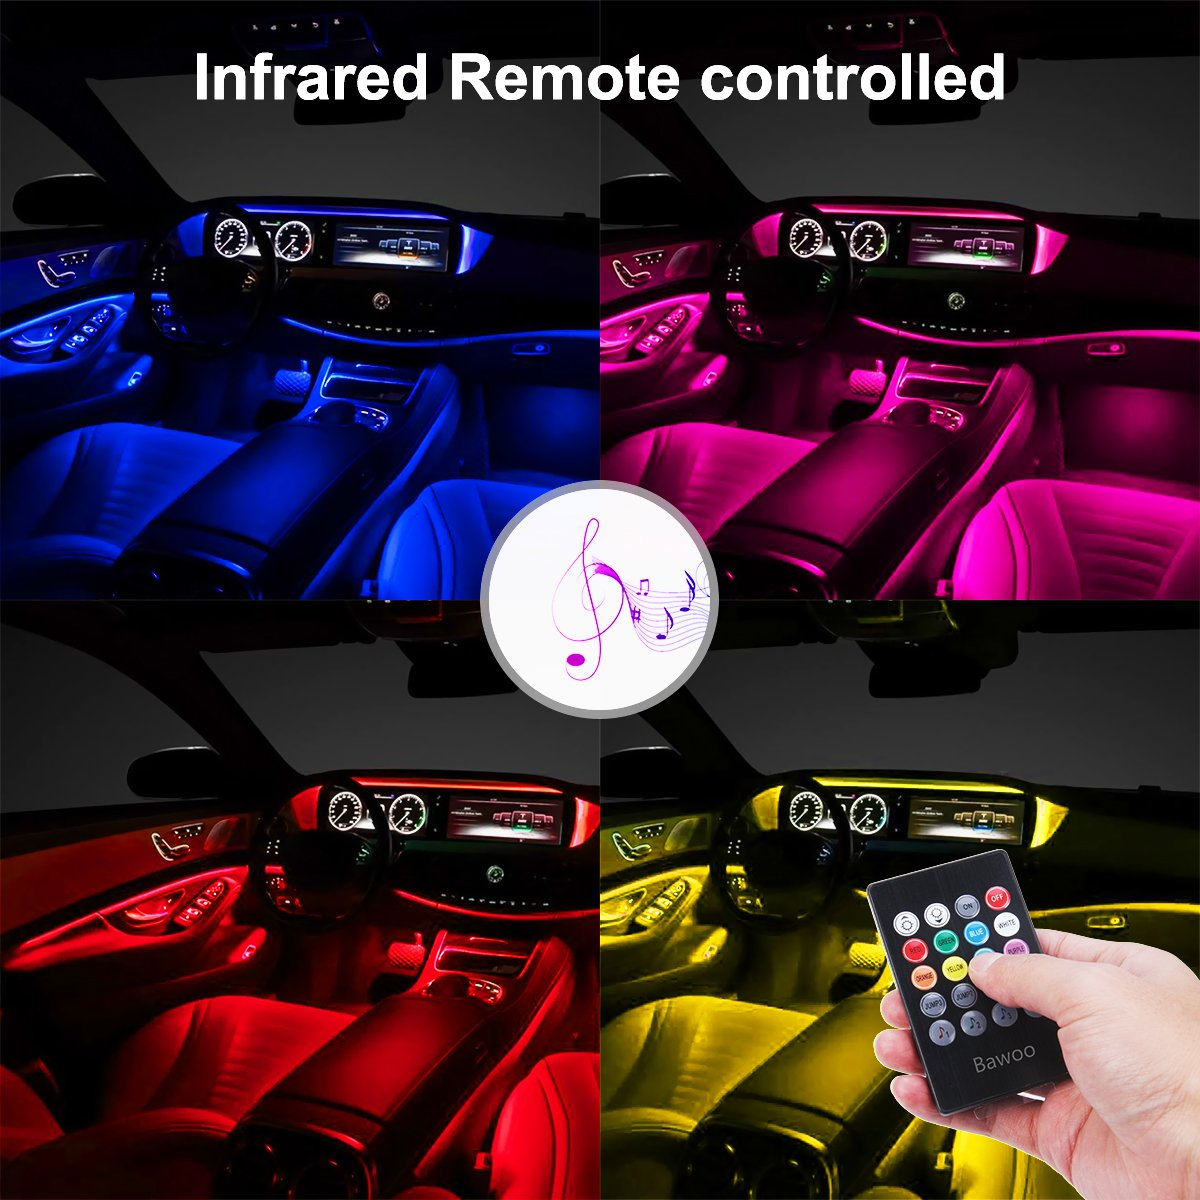 Lampadine Led Auto Interni.Bawoo Luce Interna Auto Interni 48 Led Illuminazione Auto